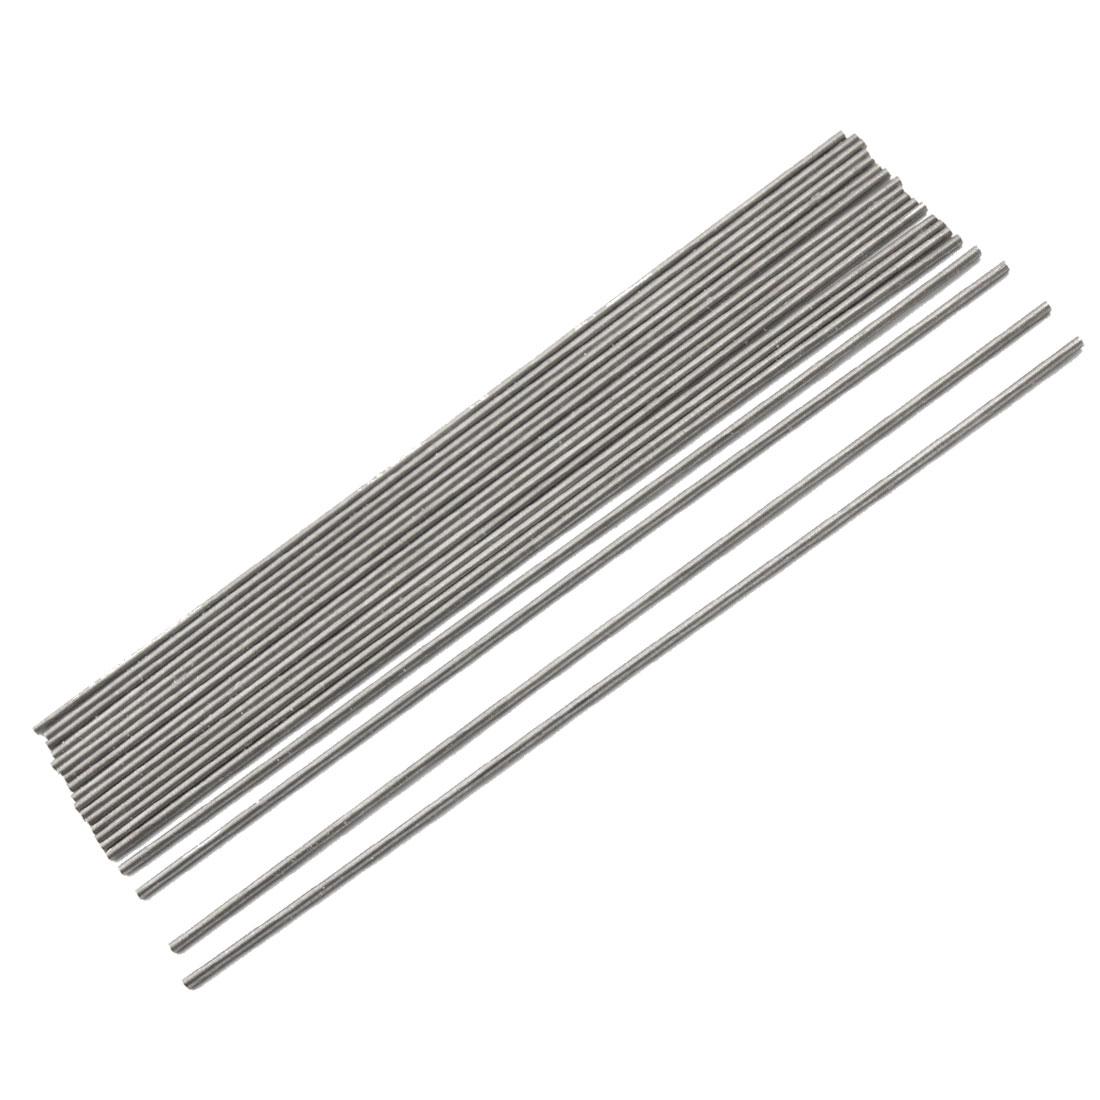 1.1mm Dia High Speed Steel Round Lathe Turning Tool Bar 20 Pcs